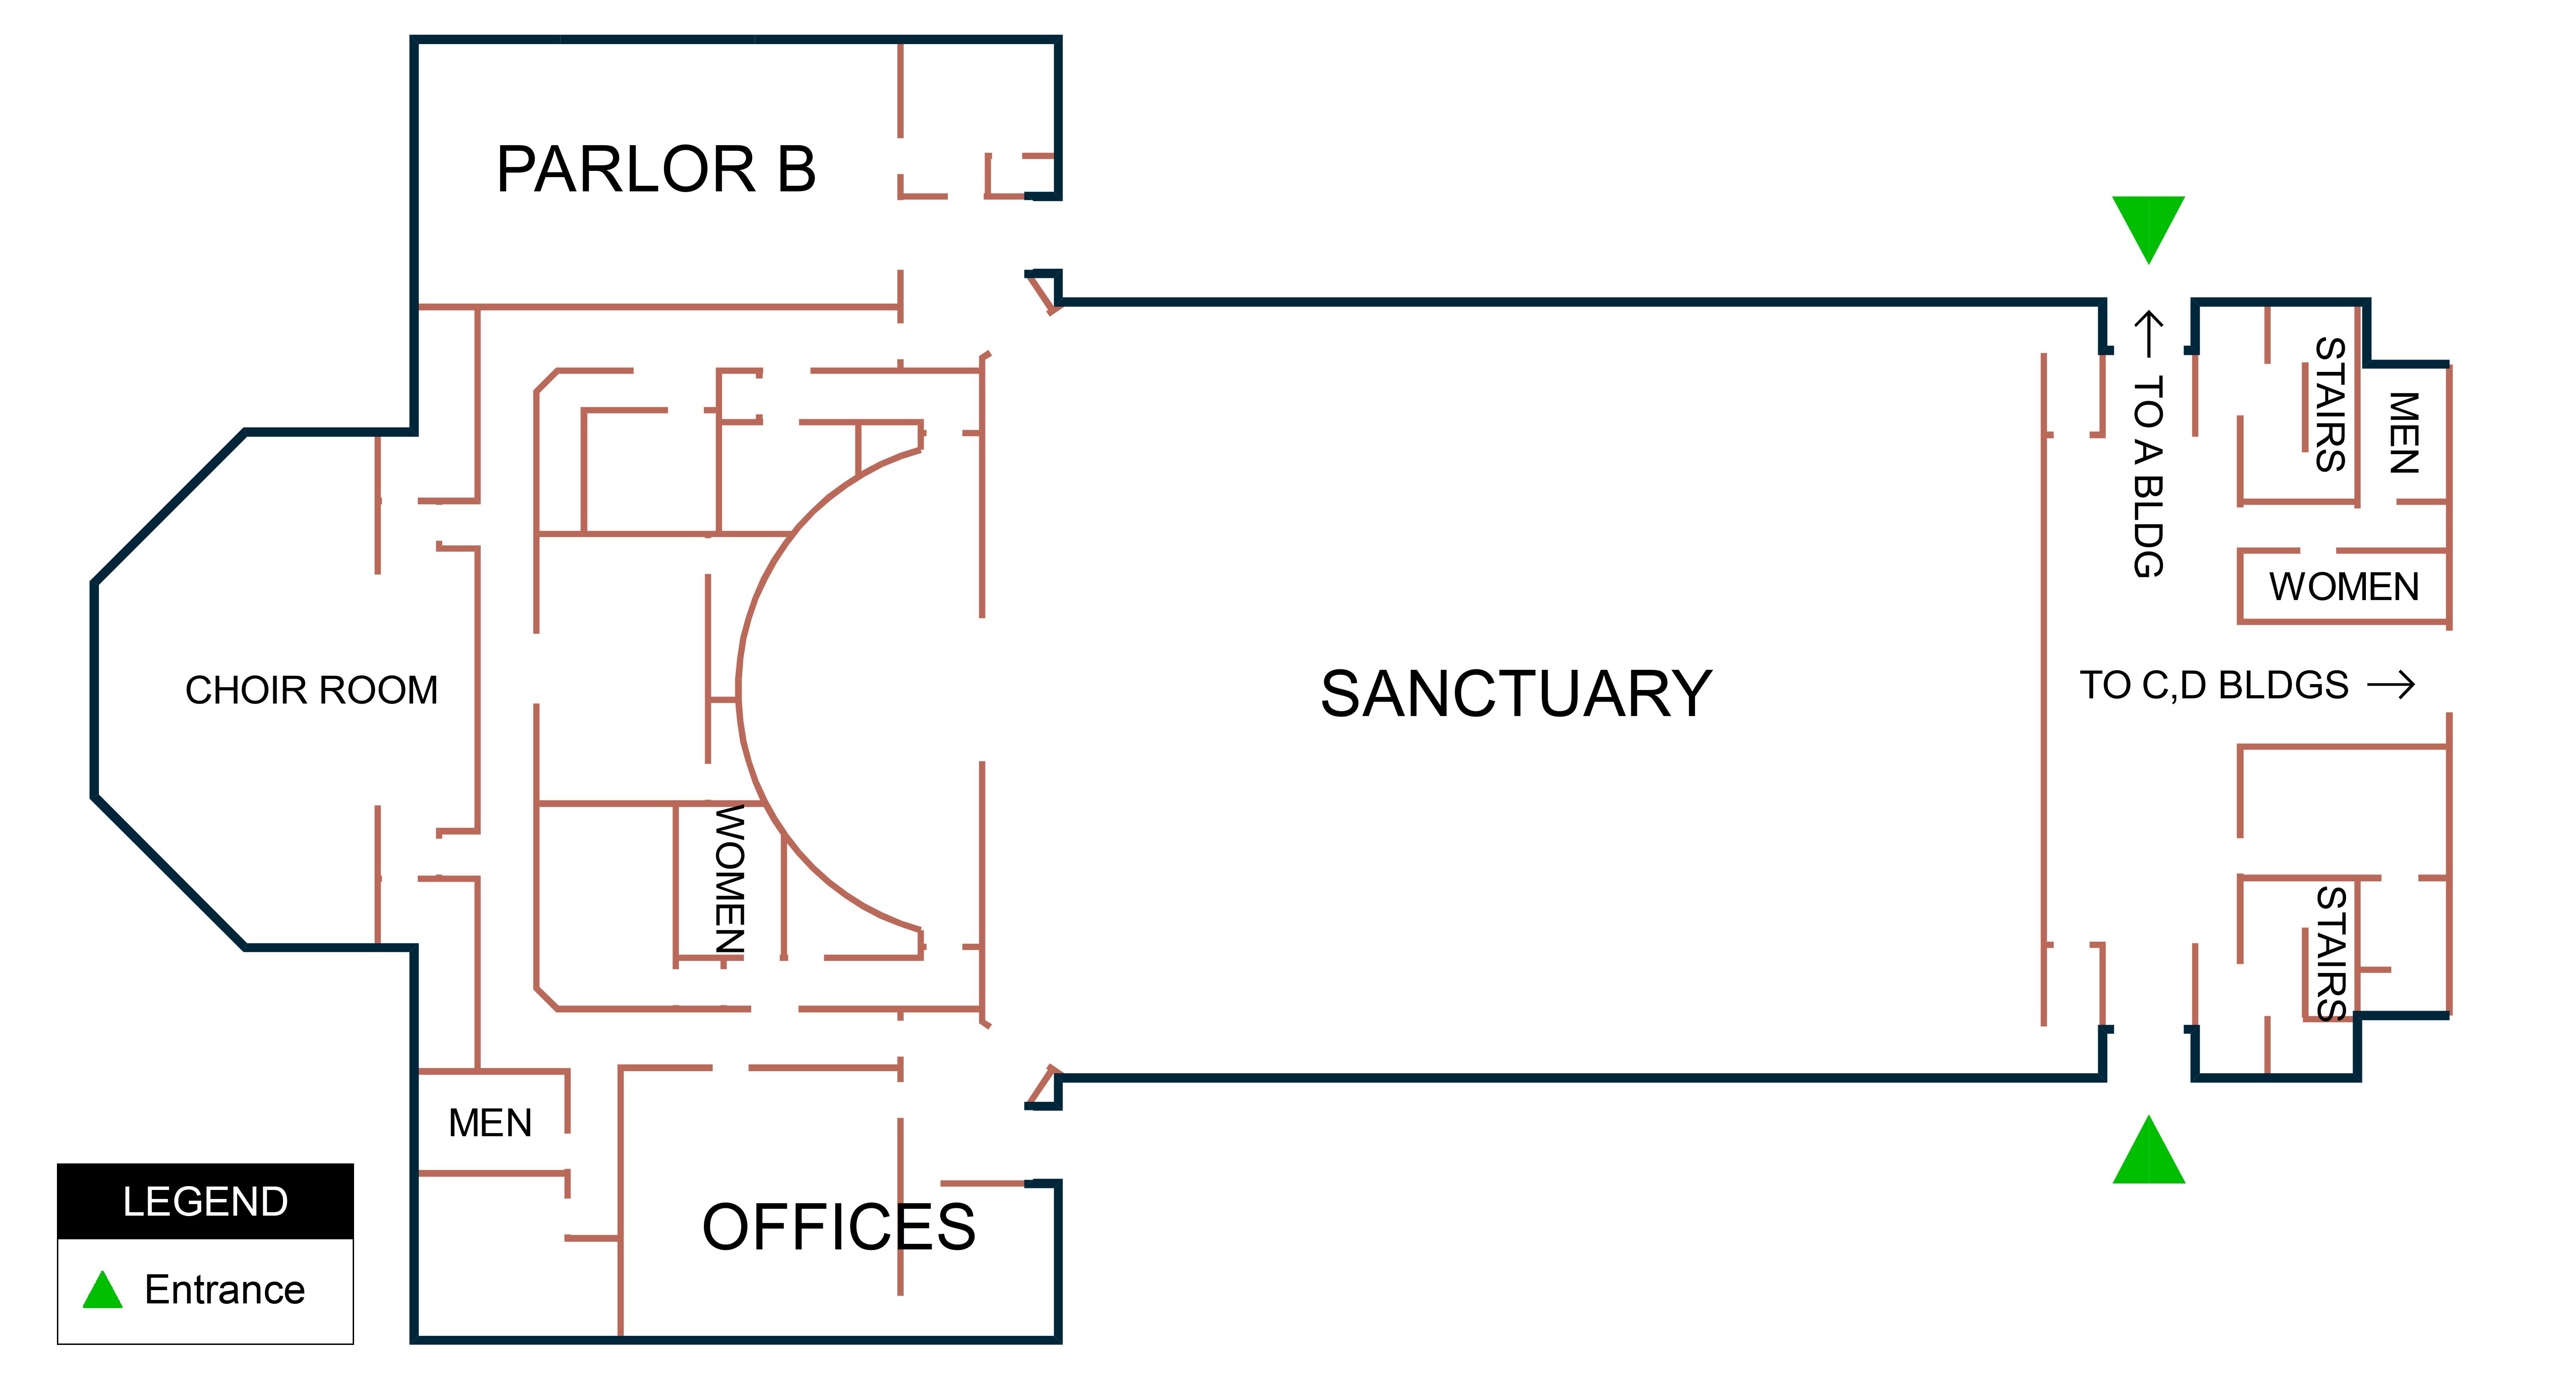 Building B - 1st Floor Map